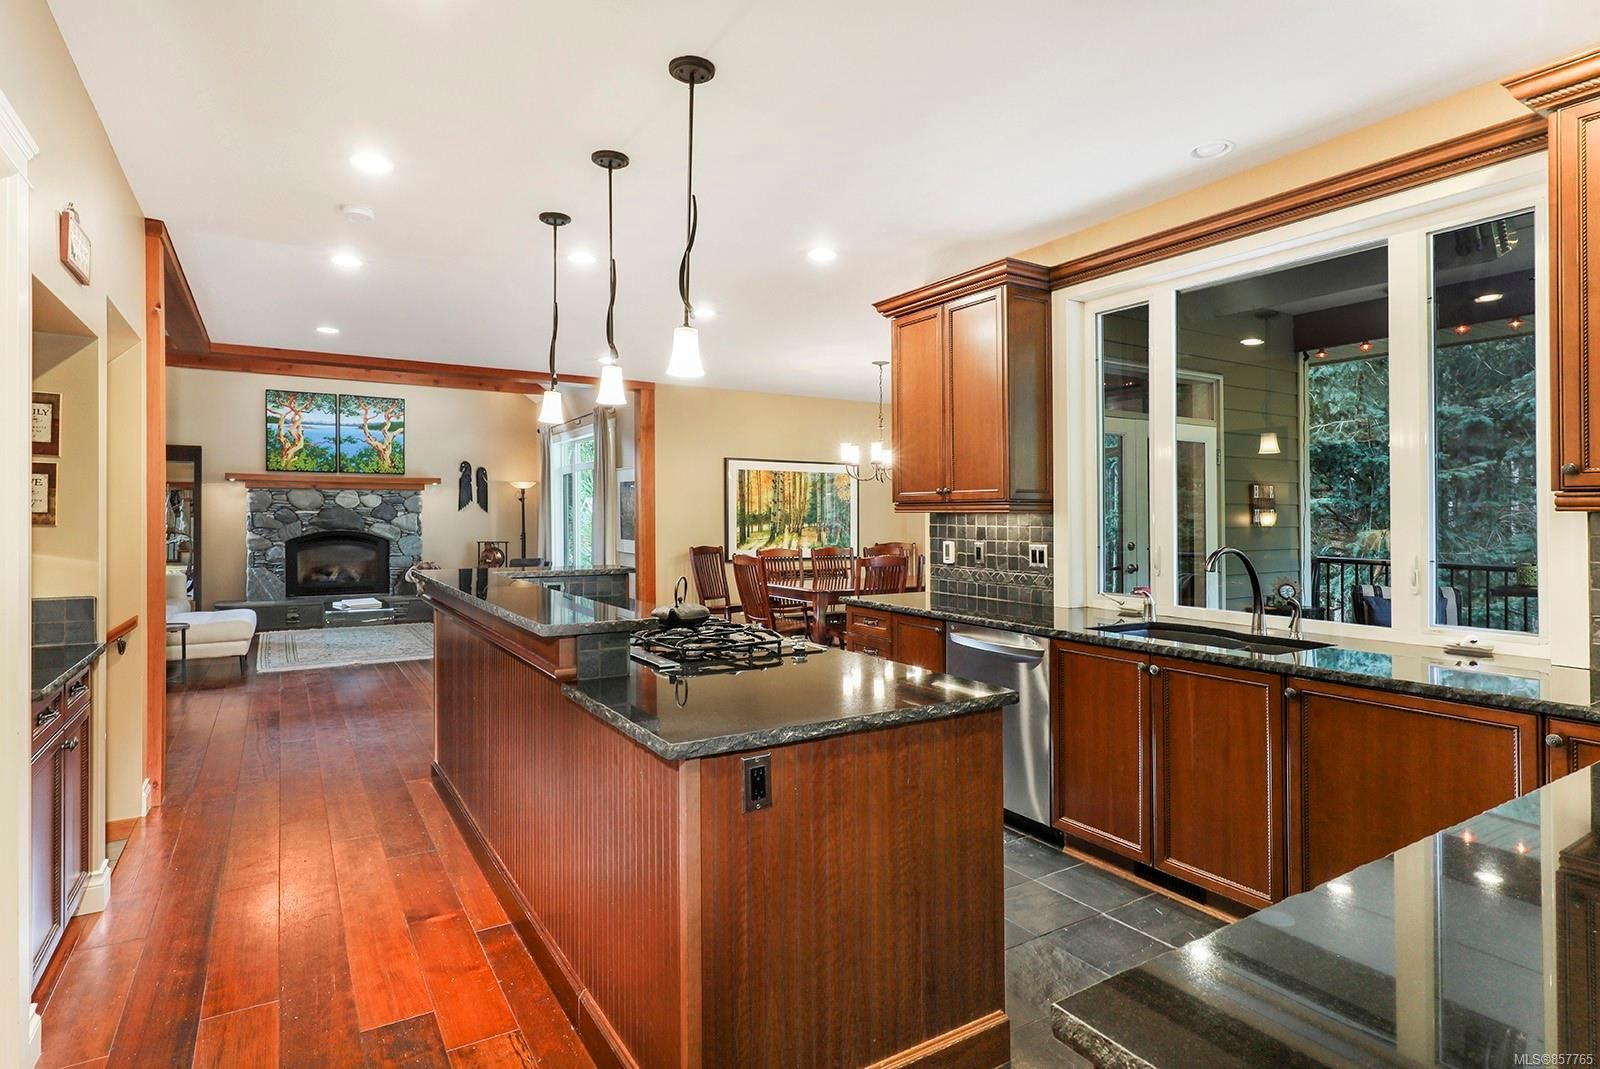 Photo 18: Photos: 1516 Highridge Dr in : CV Comox (Town of) House for sale (Comox Valley)  : MLS®# 857765